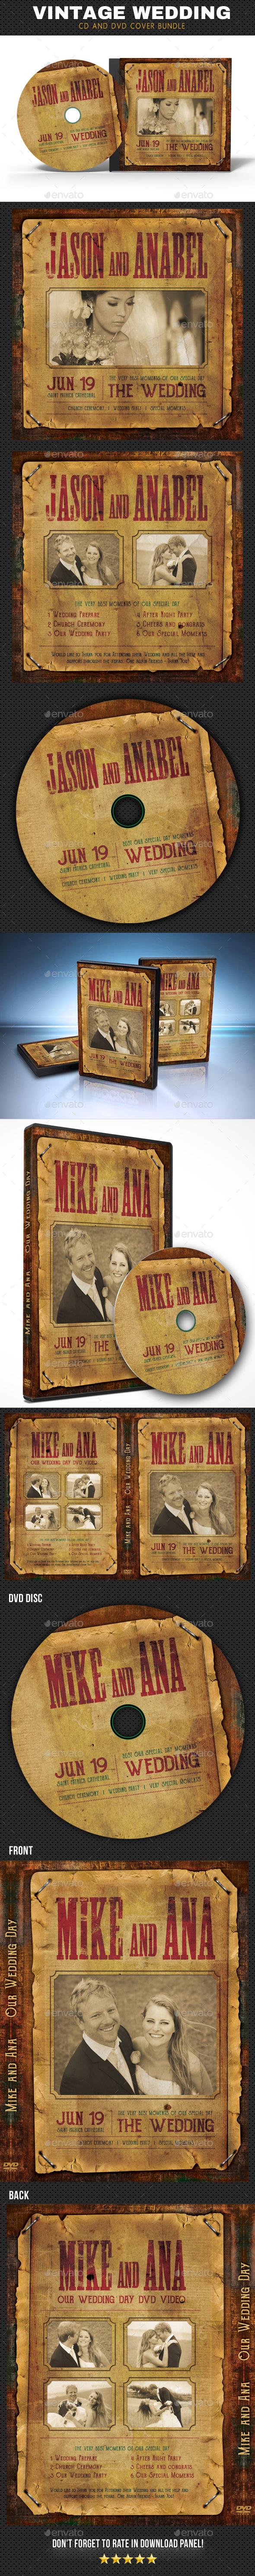 Vintage Wedding CD - DVD Cover Bundle - CD & DVD Artwork Print Templates